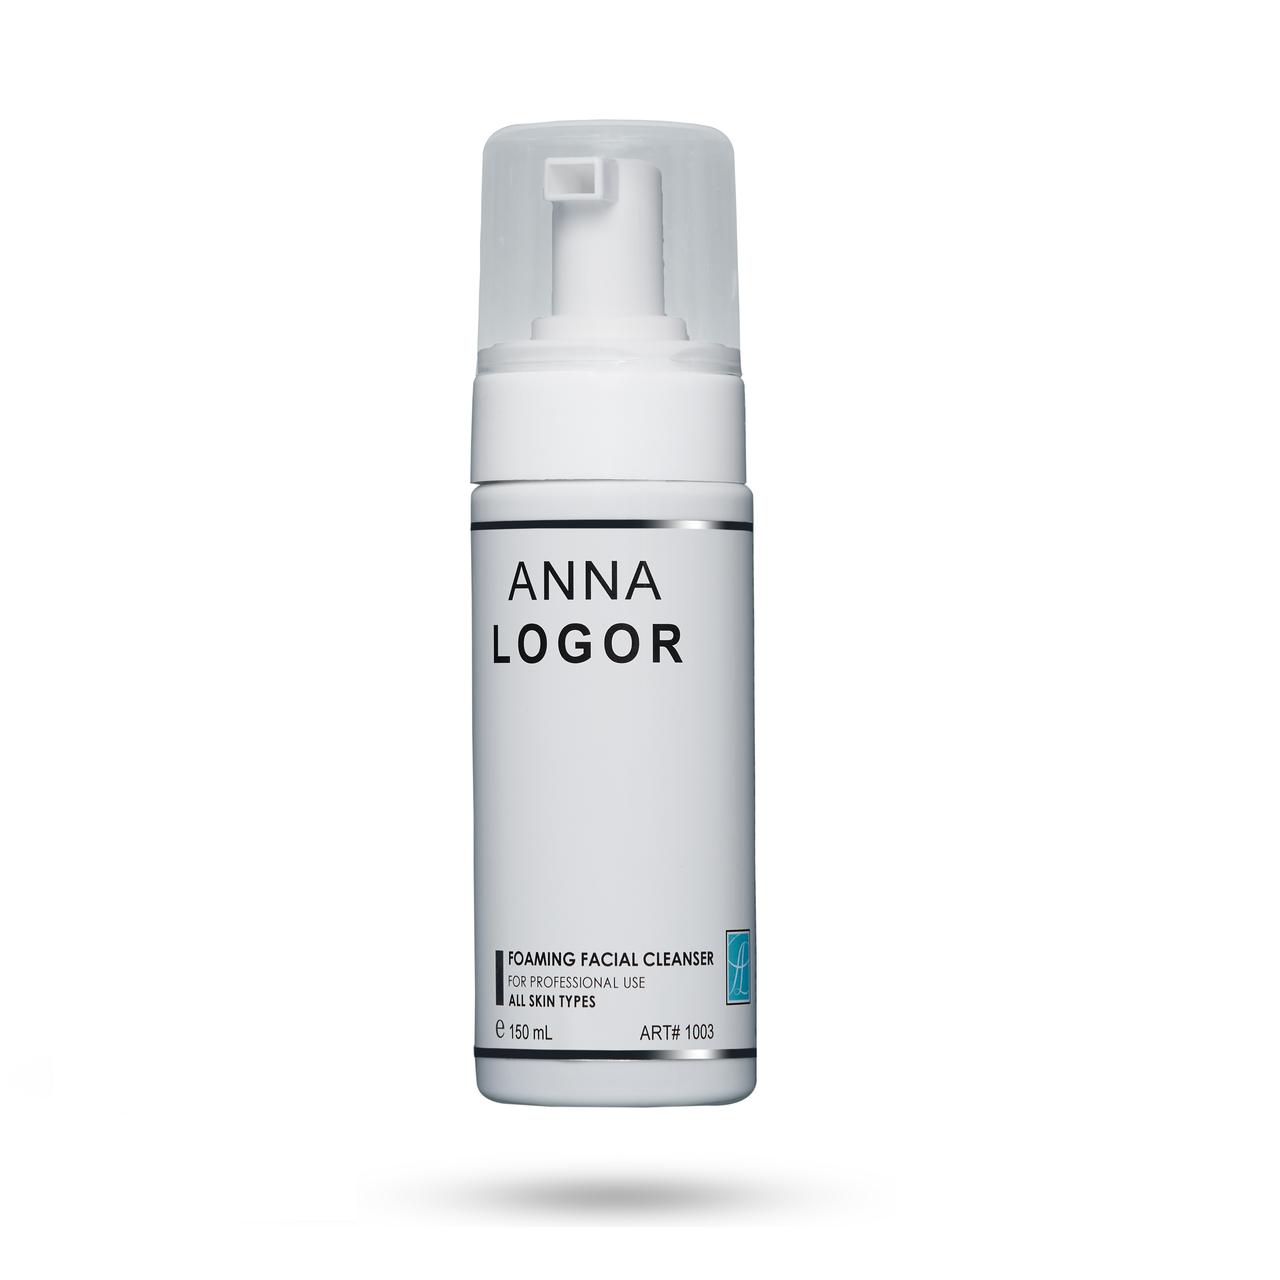 Пінний очищувач обличчя Анна Логор / Anna Logor Foaming Facial Cleanser Код 1003